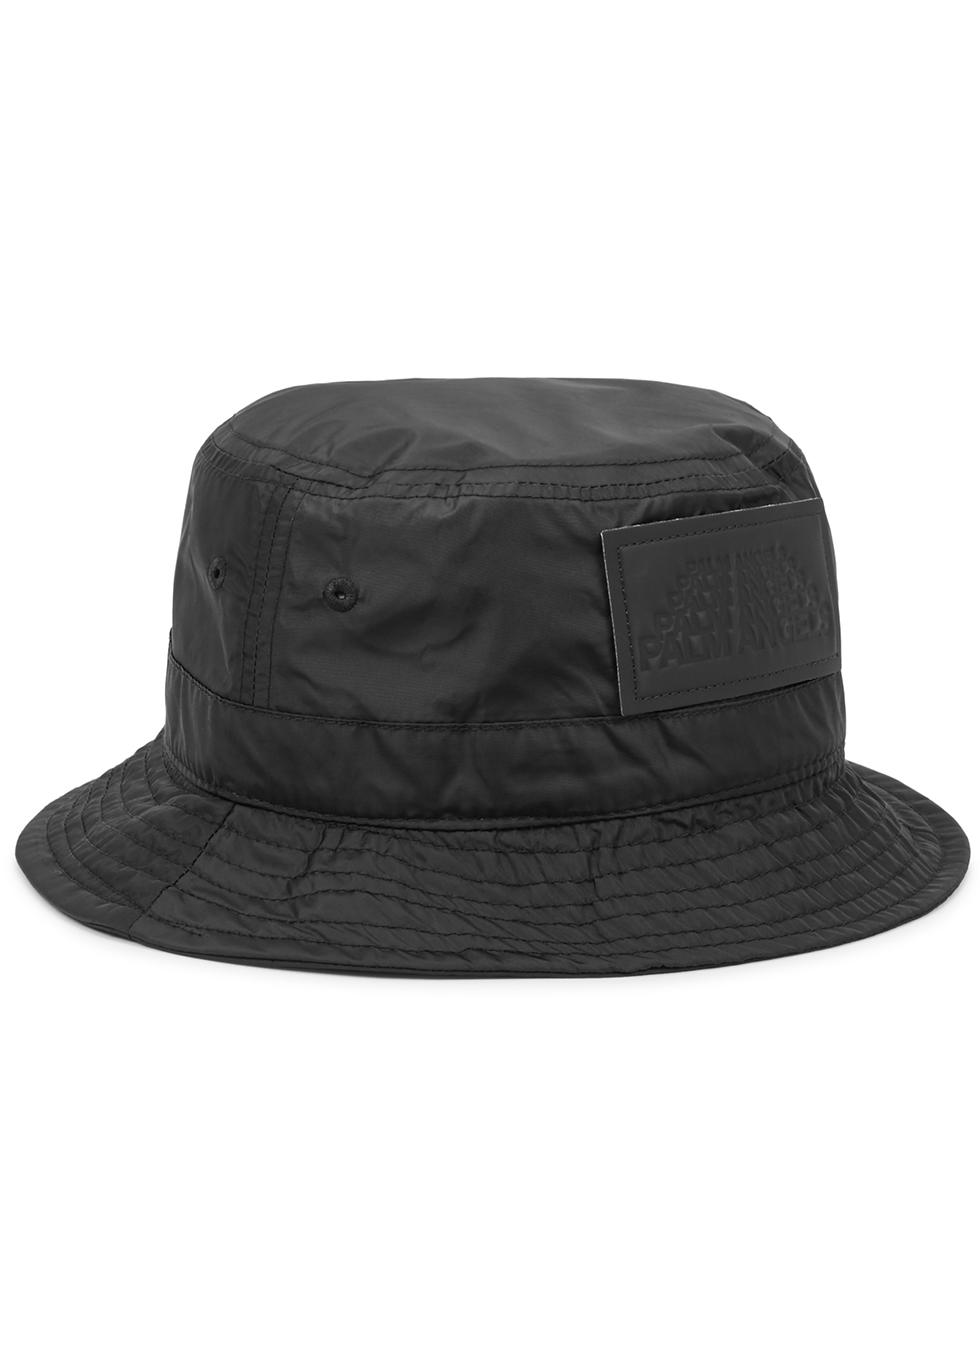 25efc49d9b3 New In Men s Designer Clothing and Fashion - Harvey Nichols